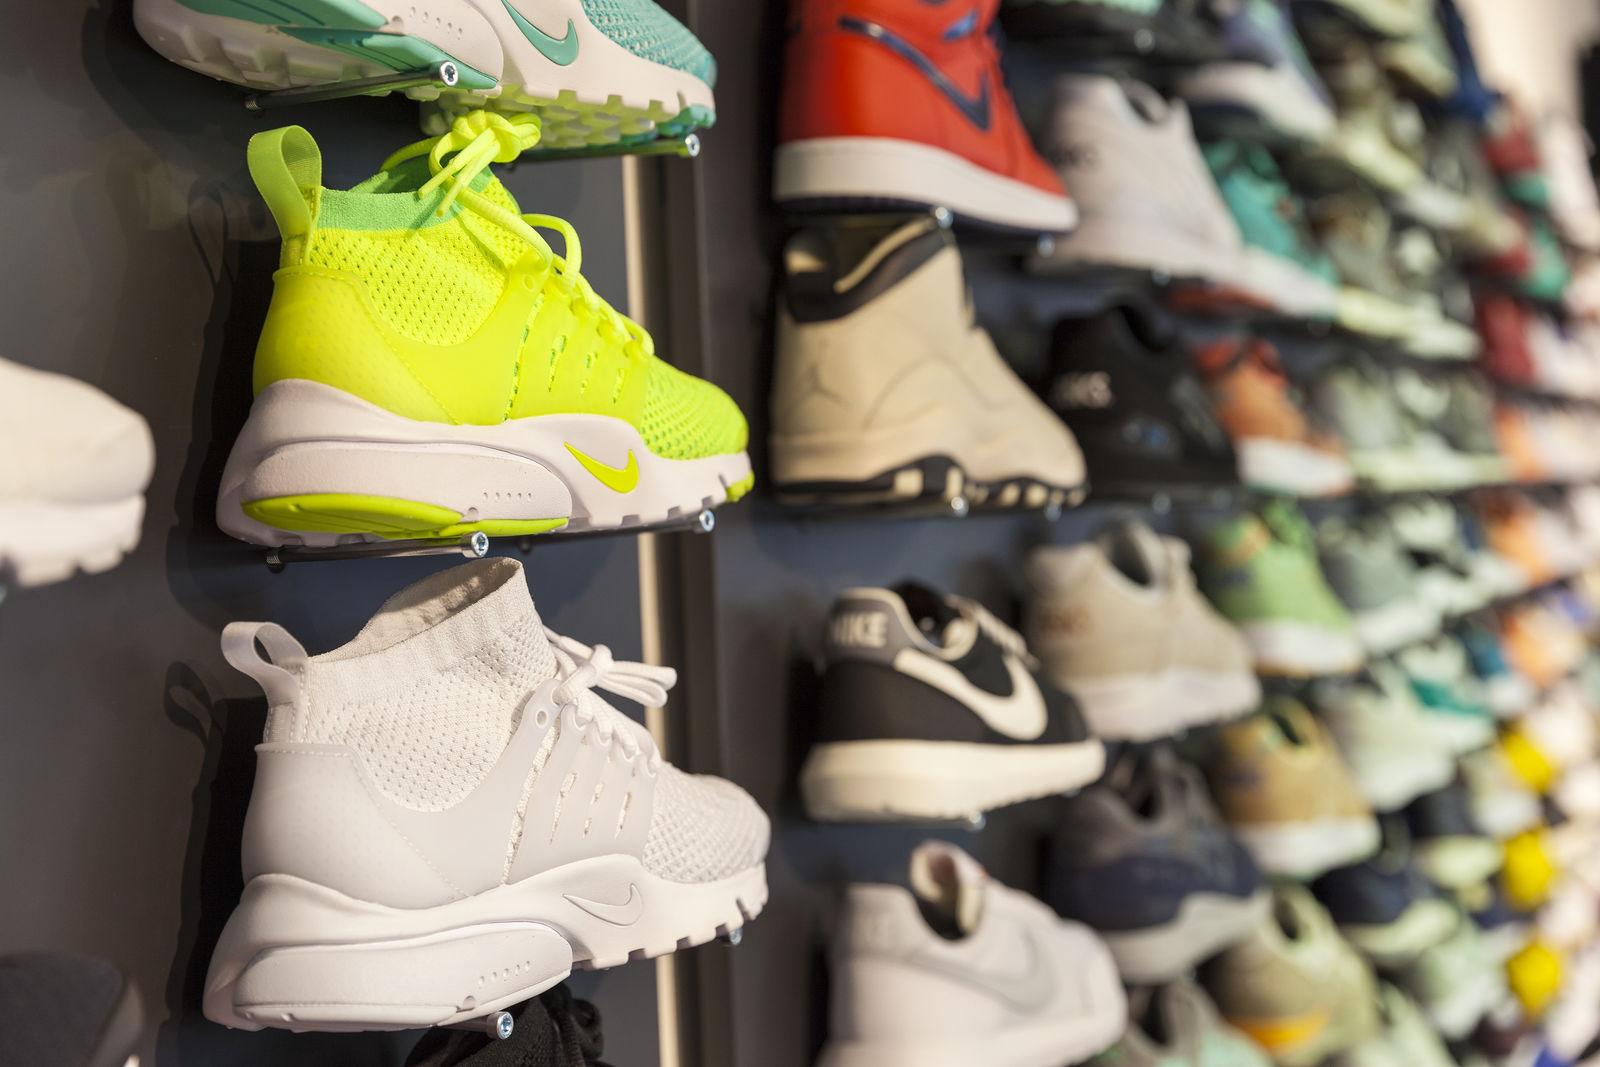 Allike Sneaker & Concept Store in Hamburg (Bild 5)